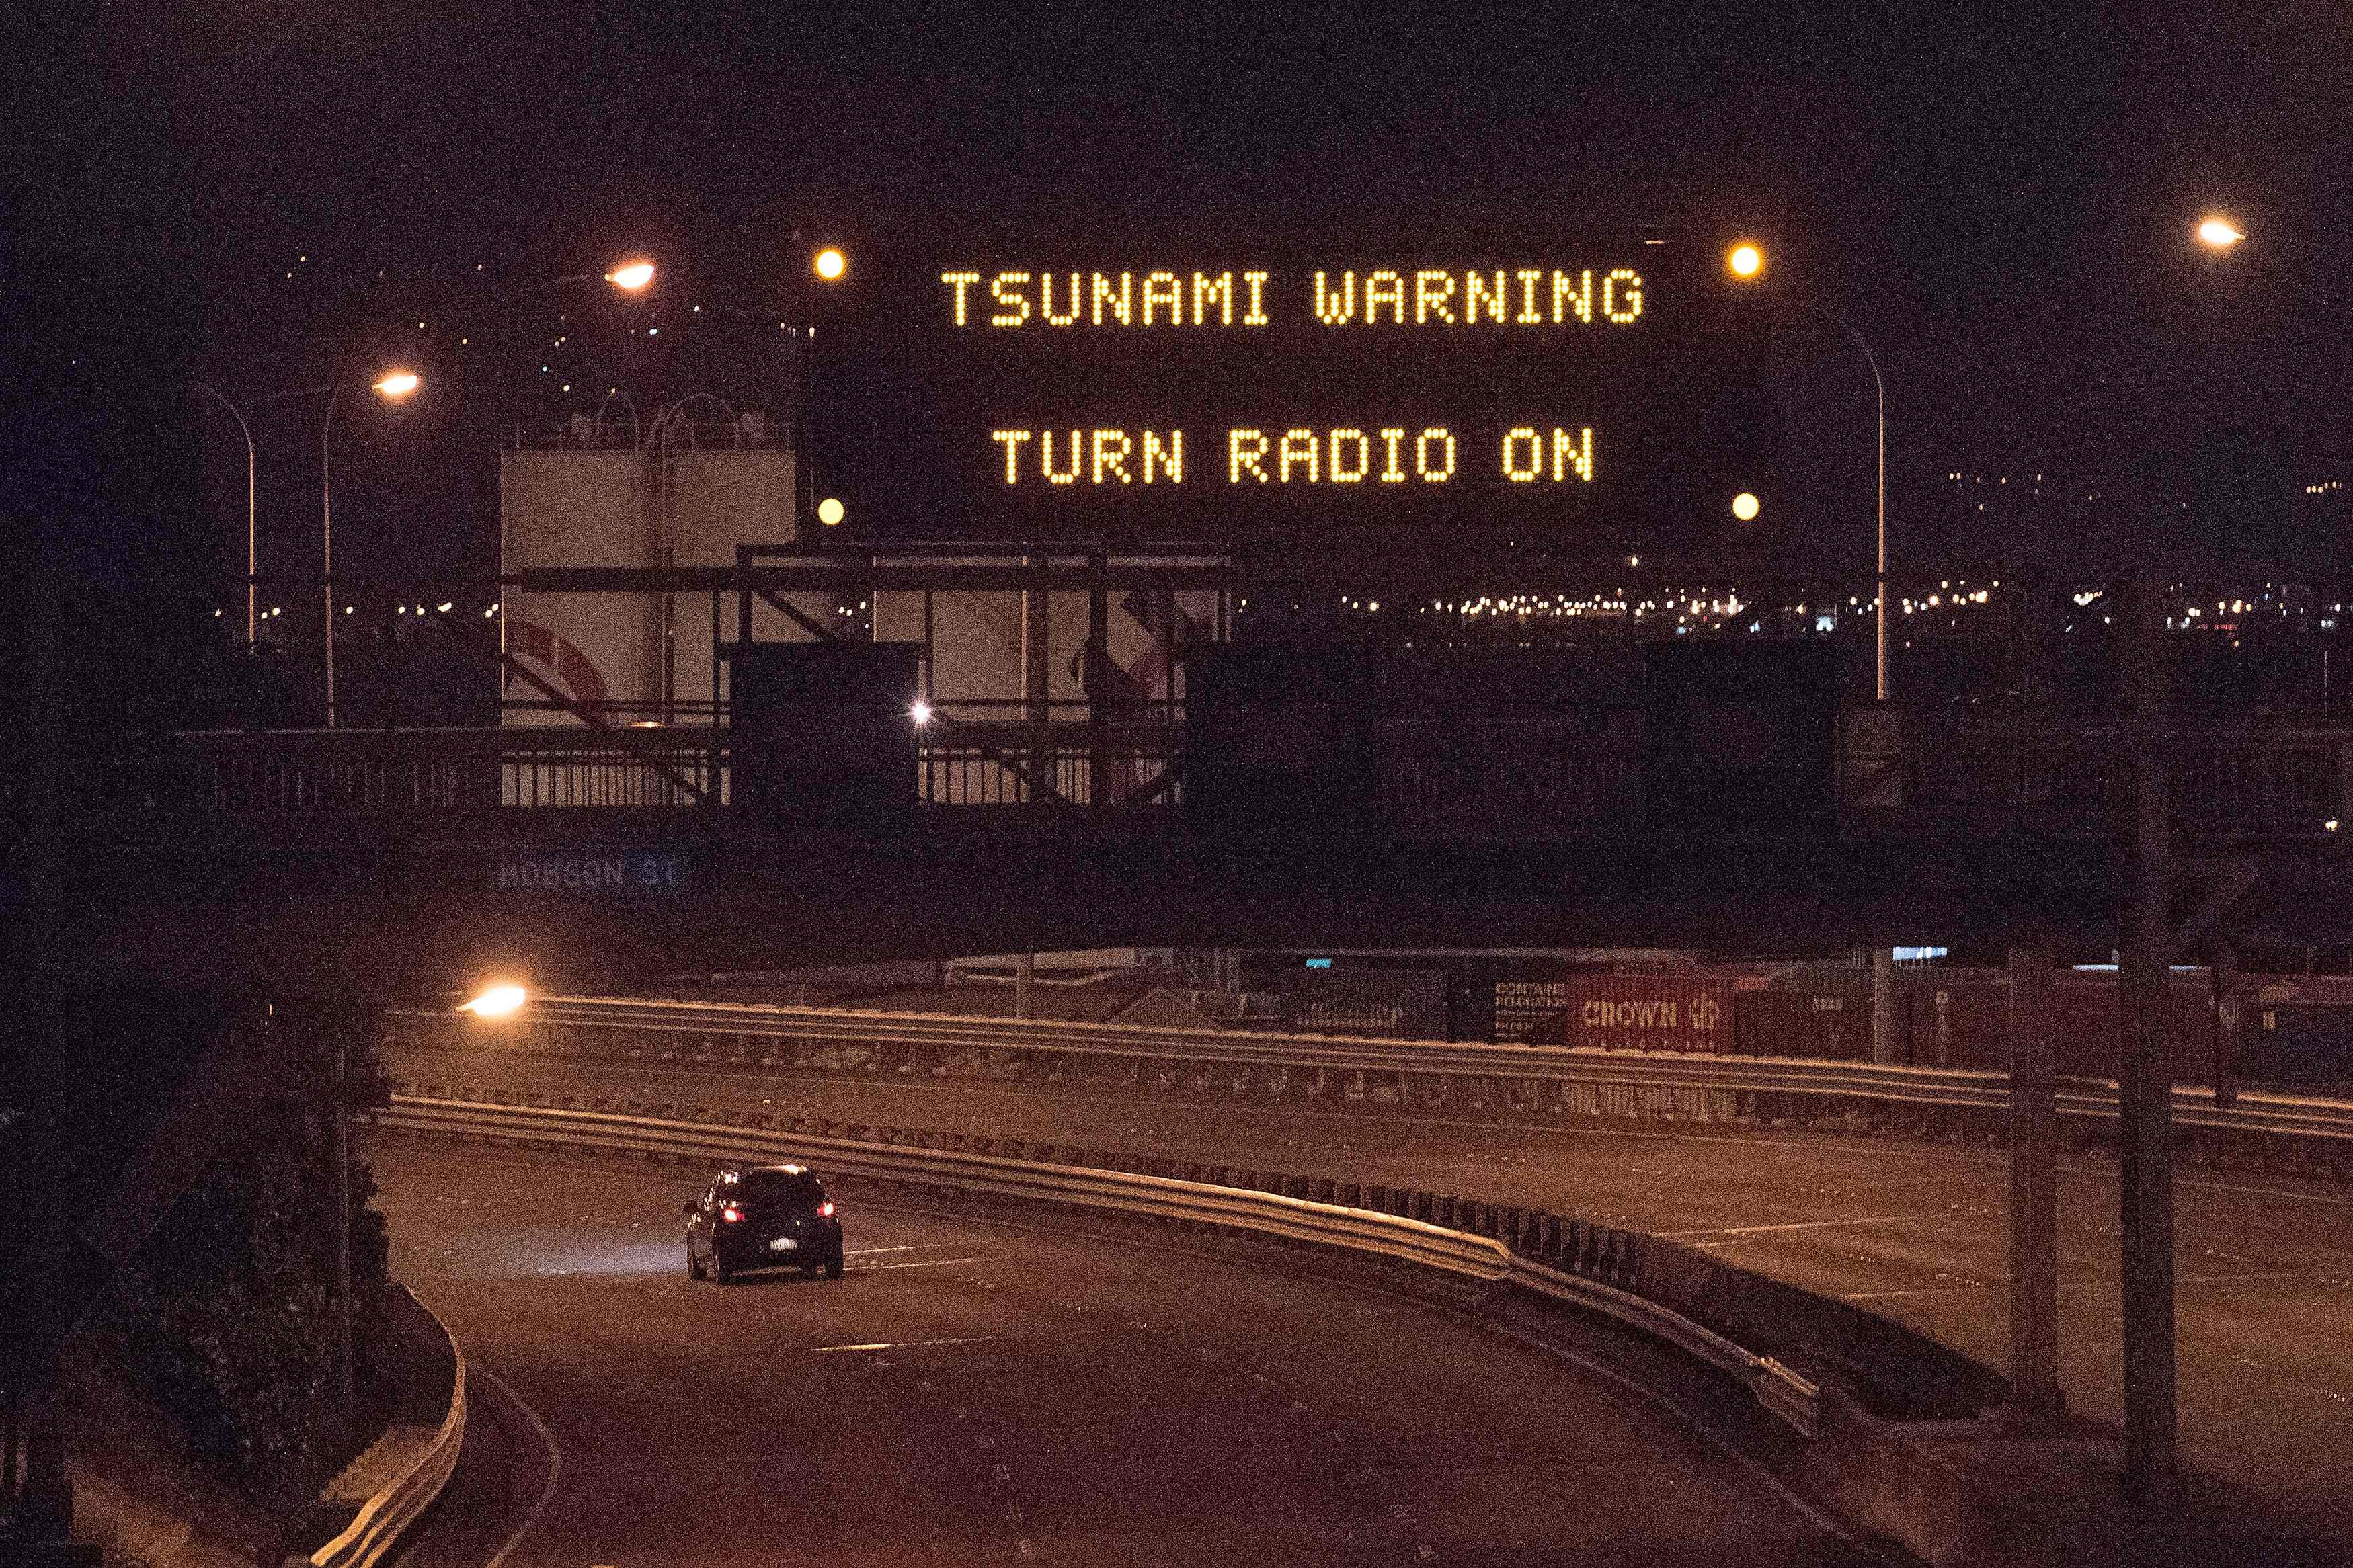 Tsunami hits New Zealand after strong earthquake